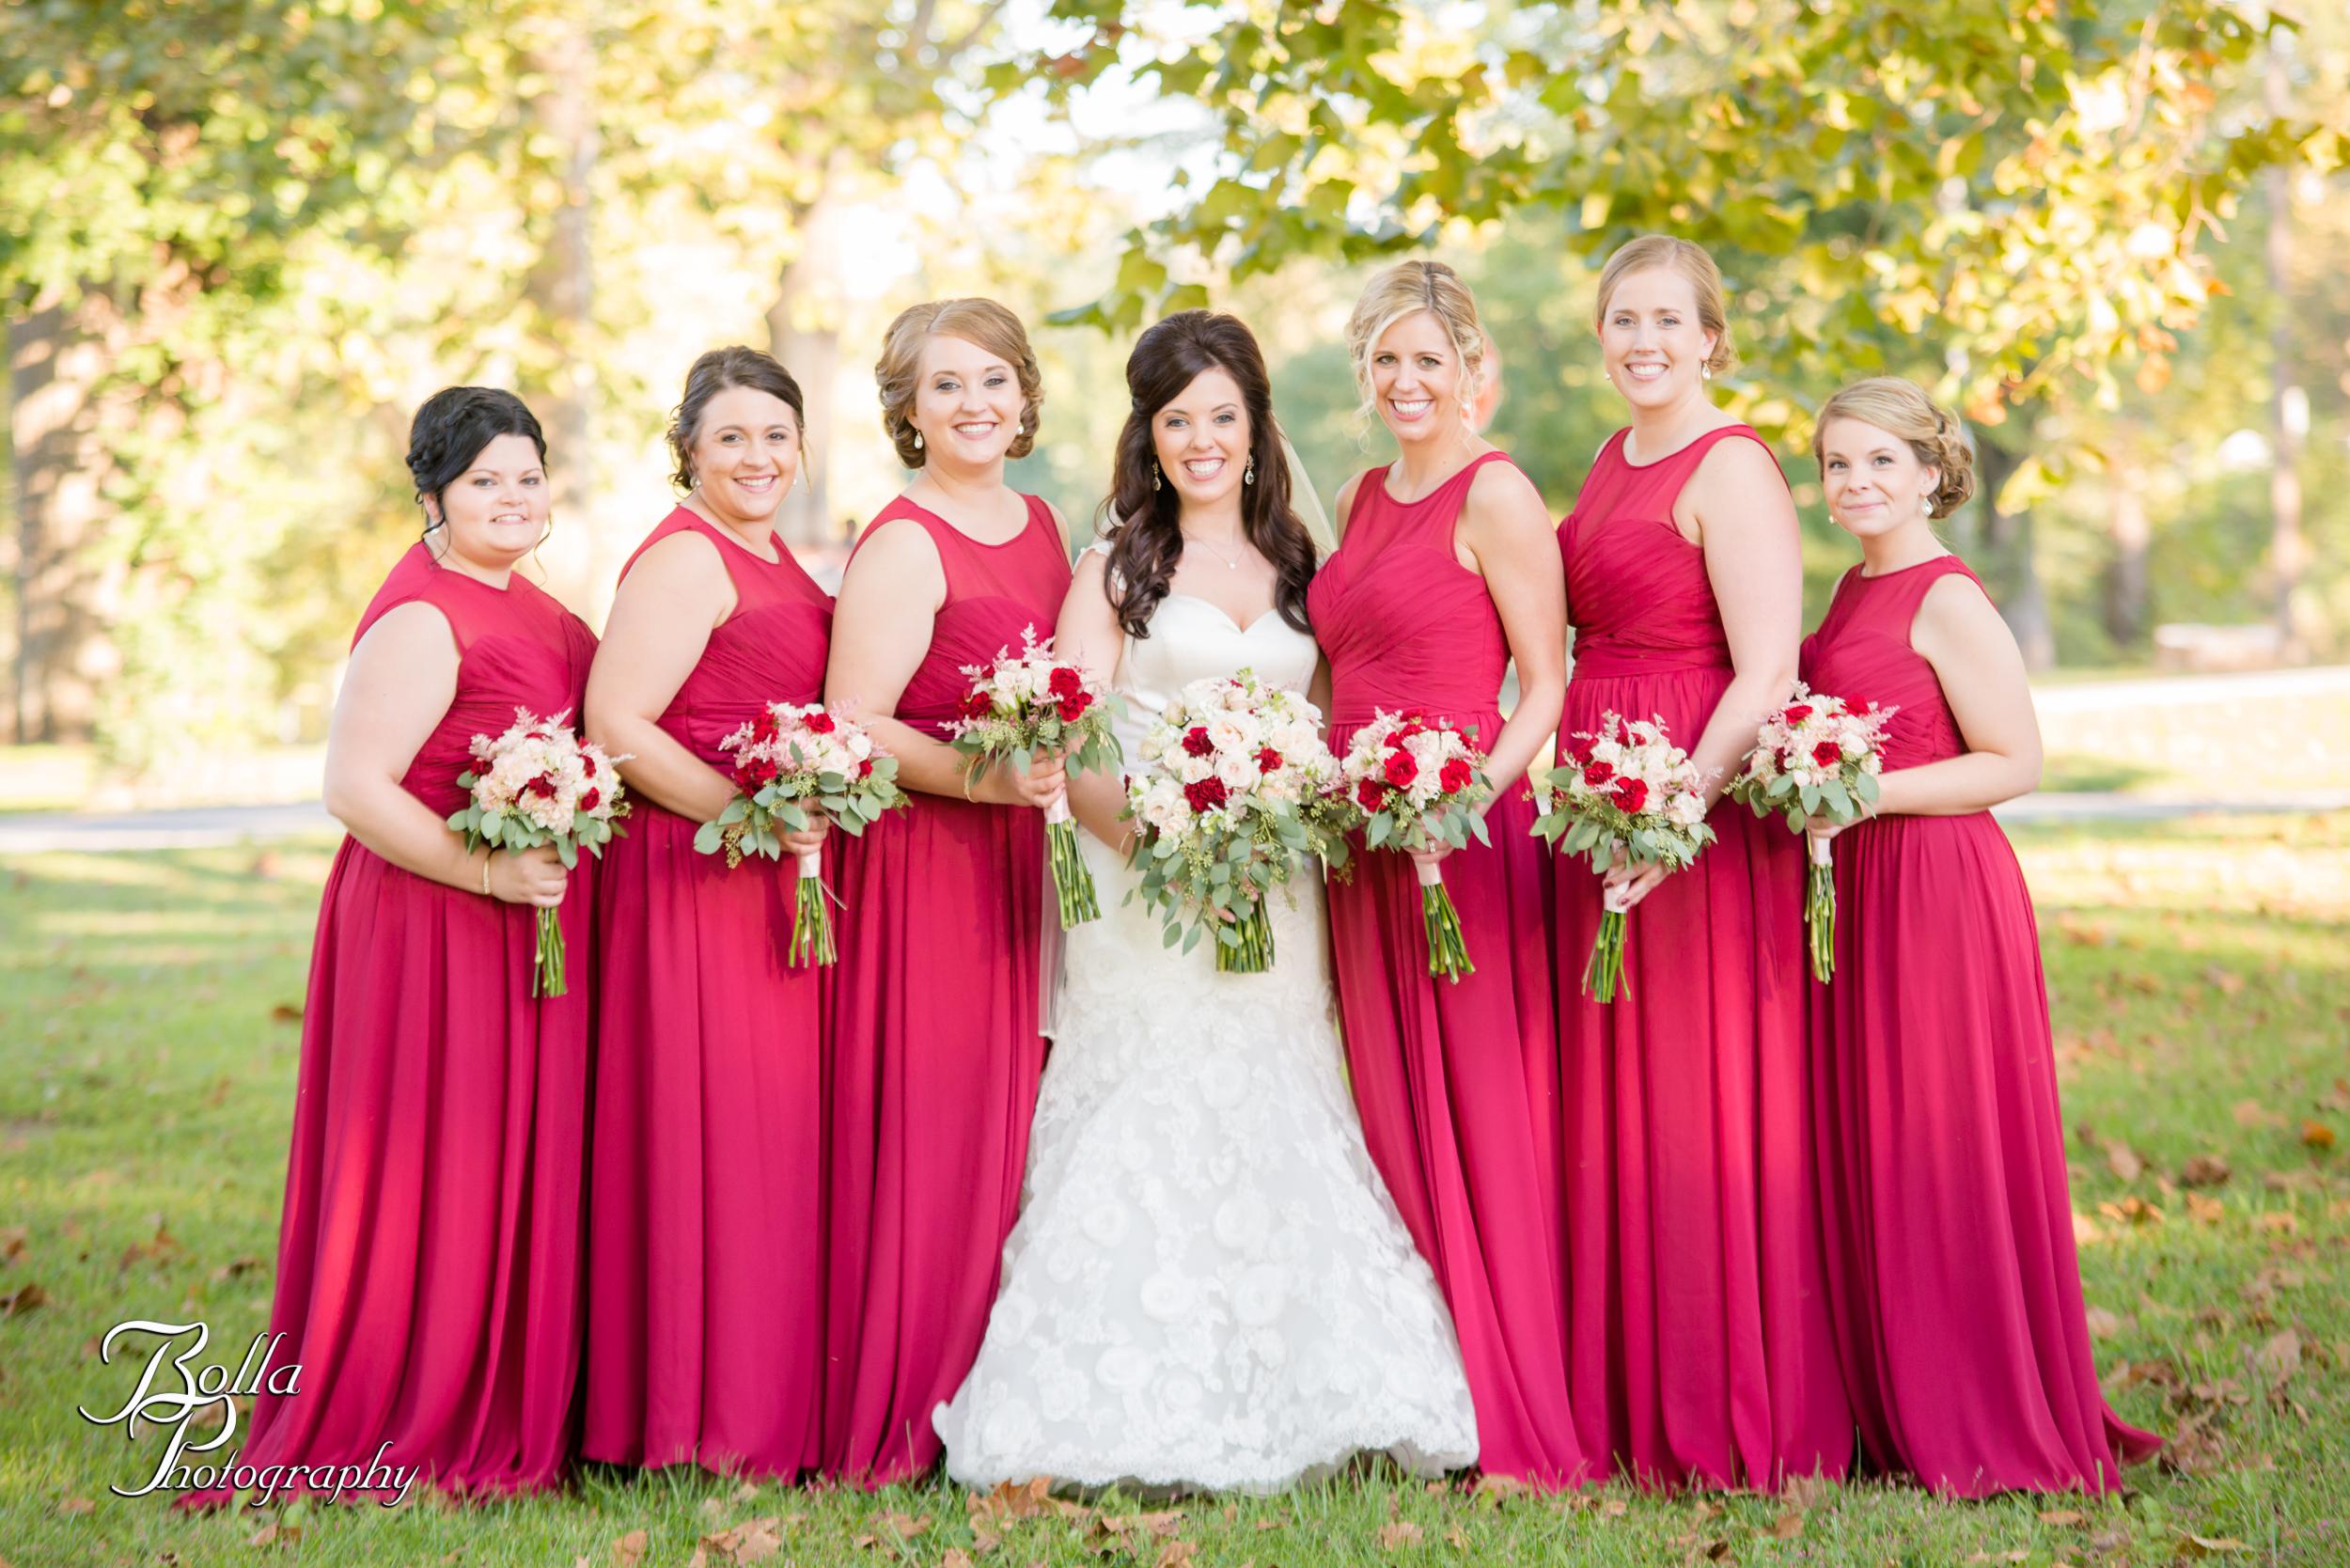 Bolla_photography_edwardsville_wedding_photographer_st_louis_weddings_Reilmann-0406.jpg